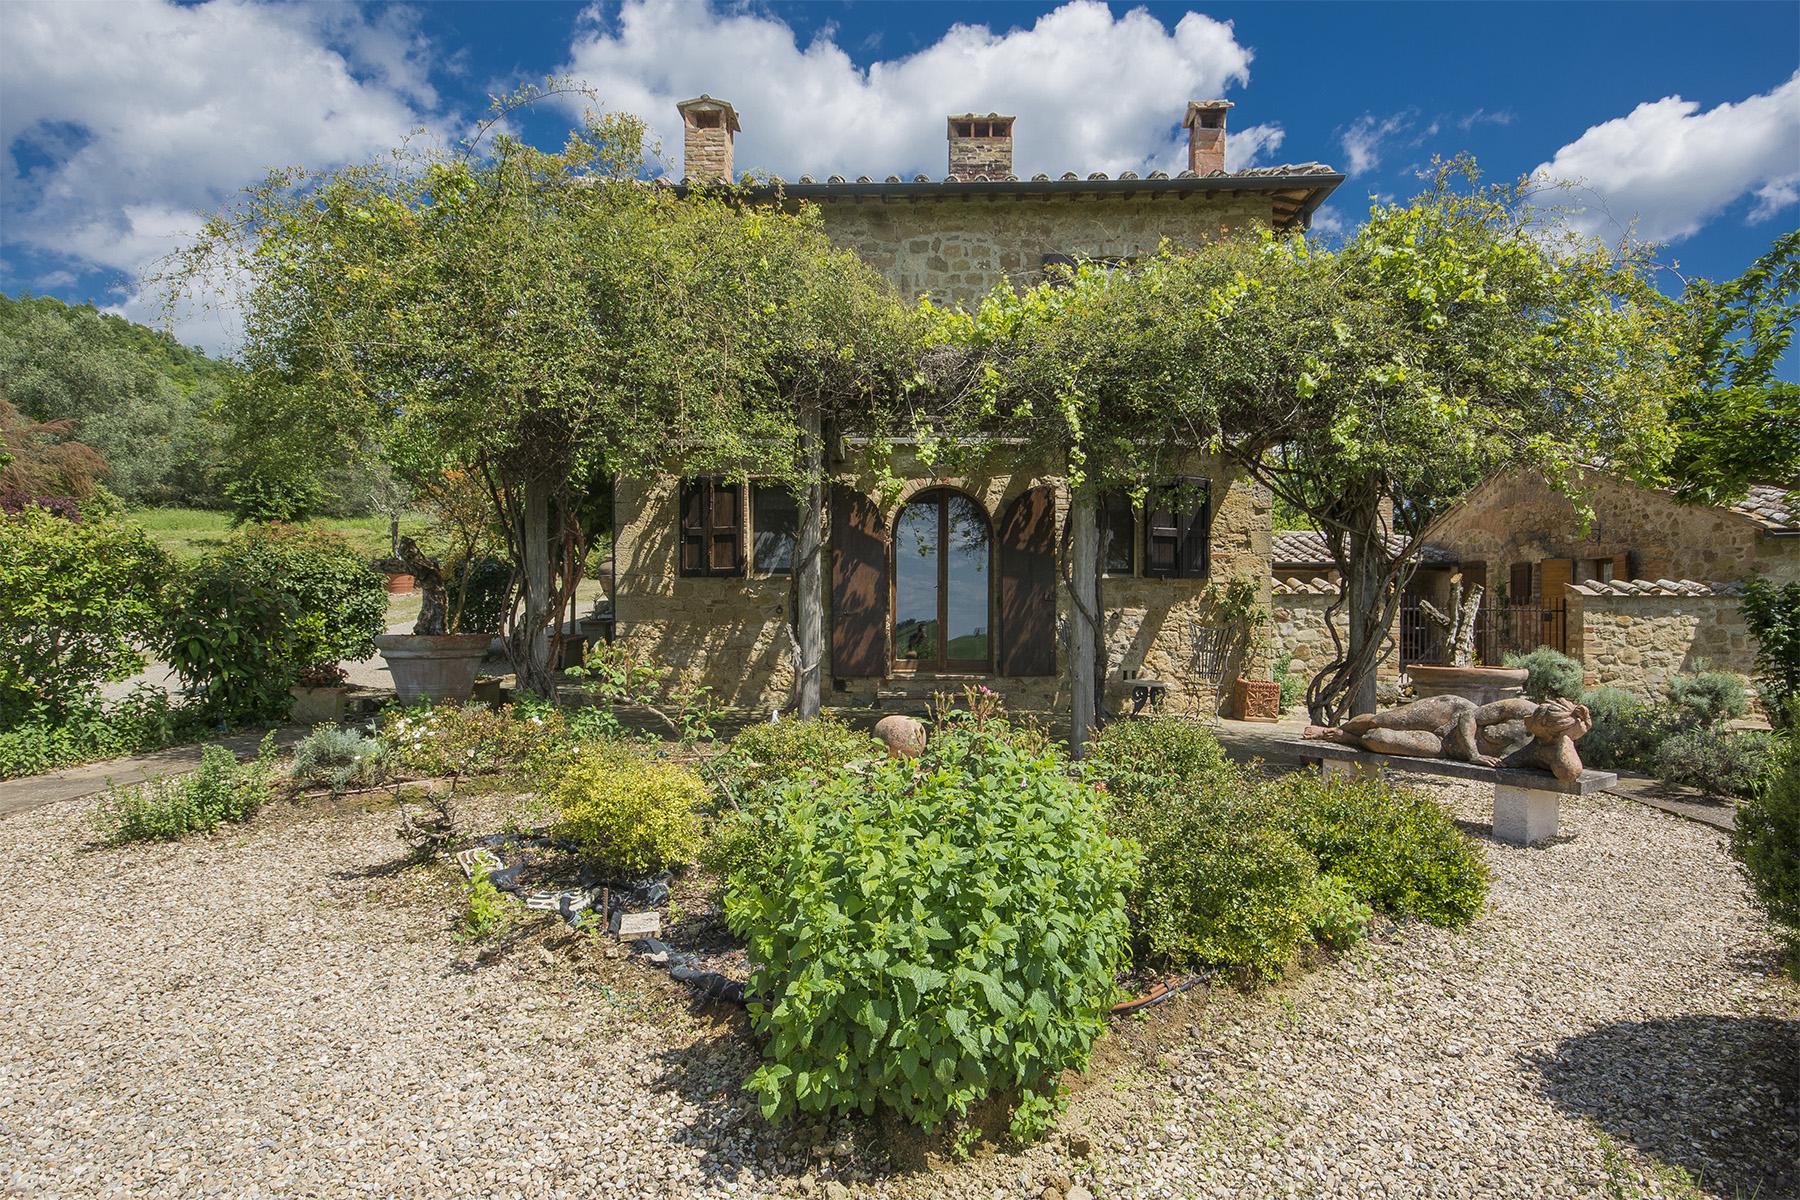 Casa indipendente in Vendita a Pienza: 5 locali, 400 mq - Foto 5